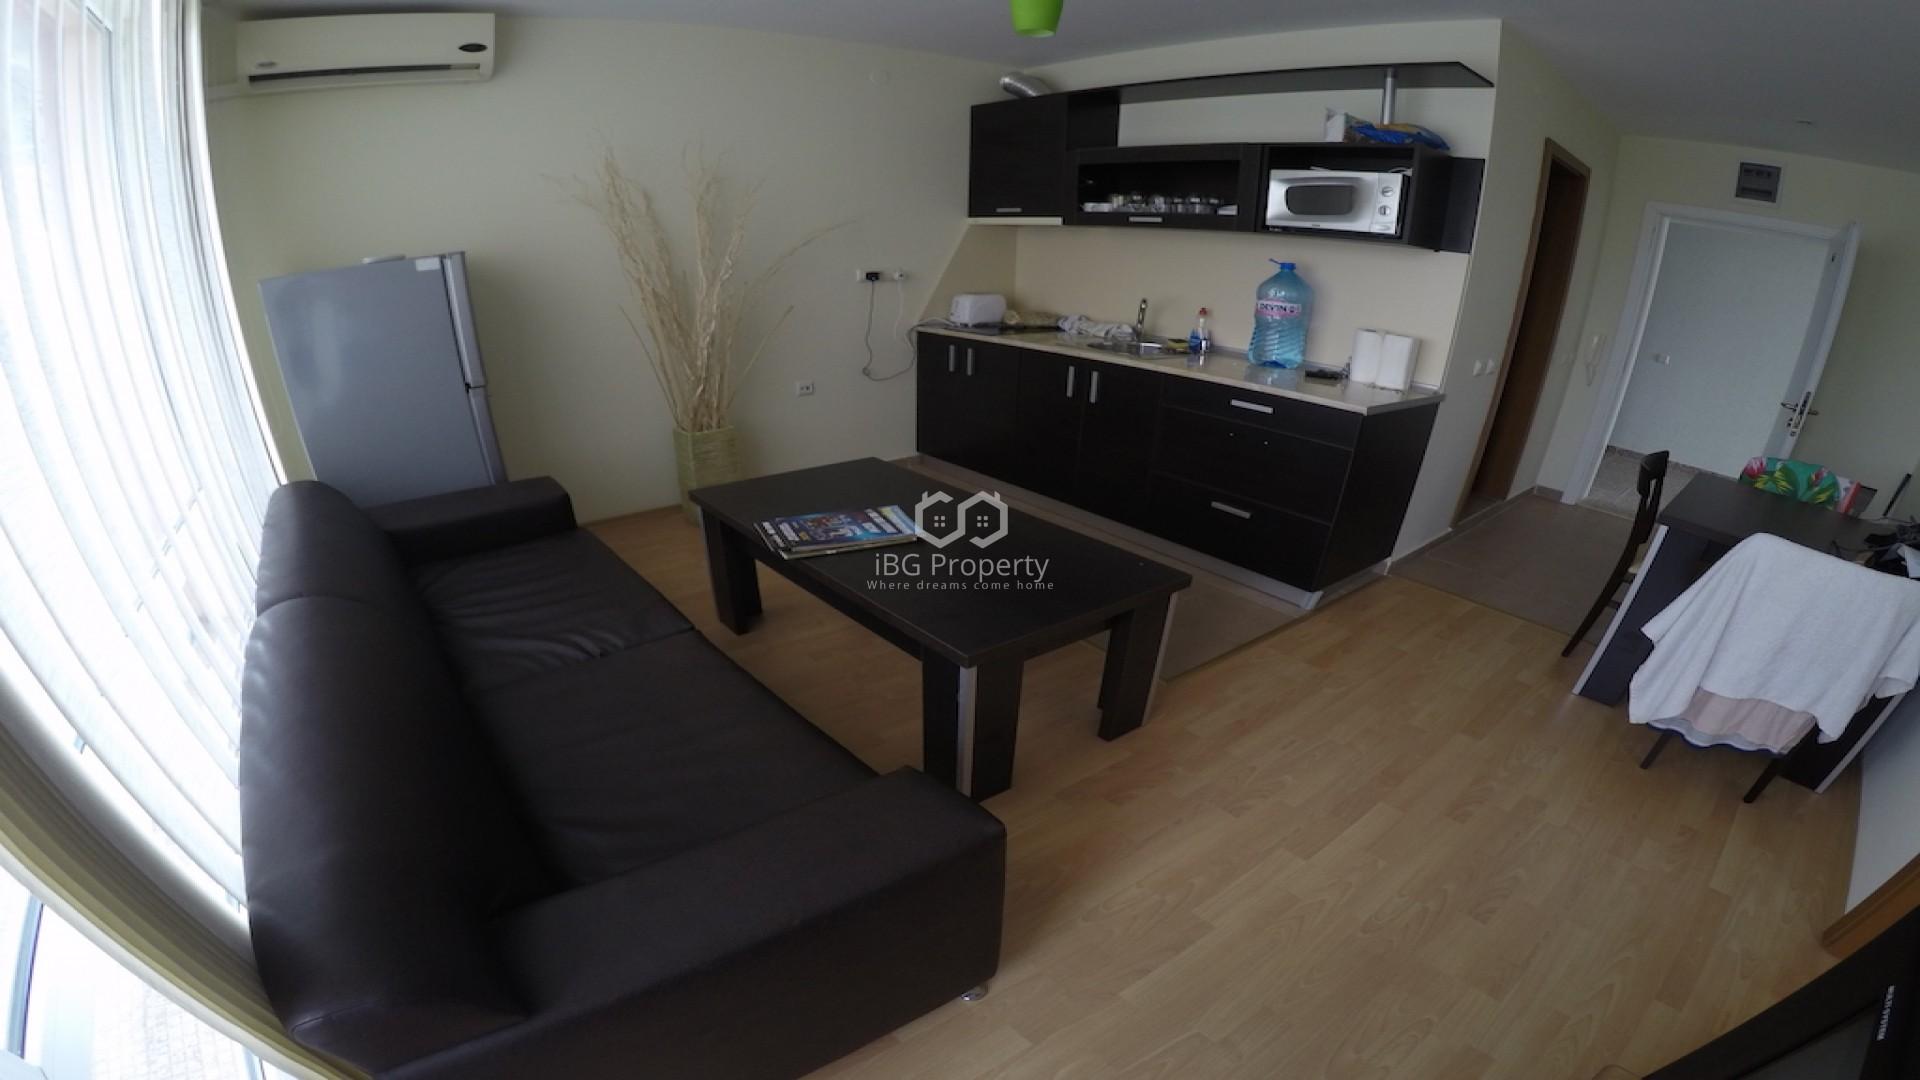 Двухкомнатная квартира Слънчев Бряг 56 m2